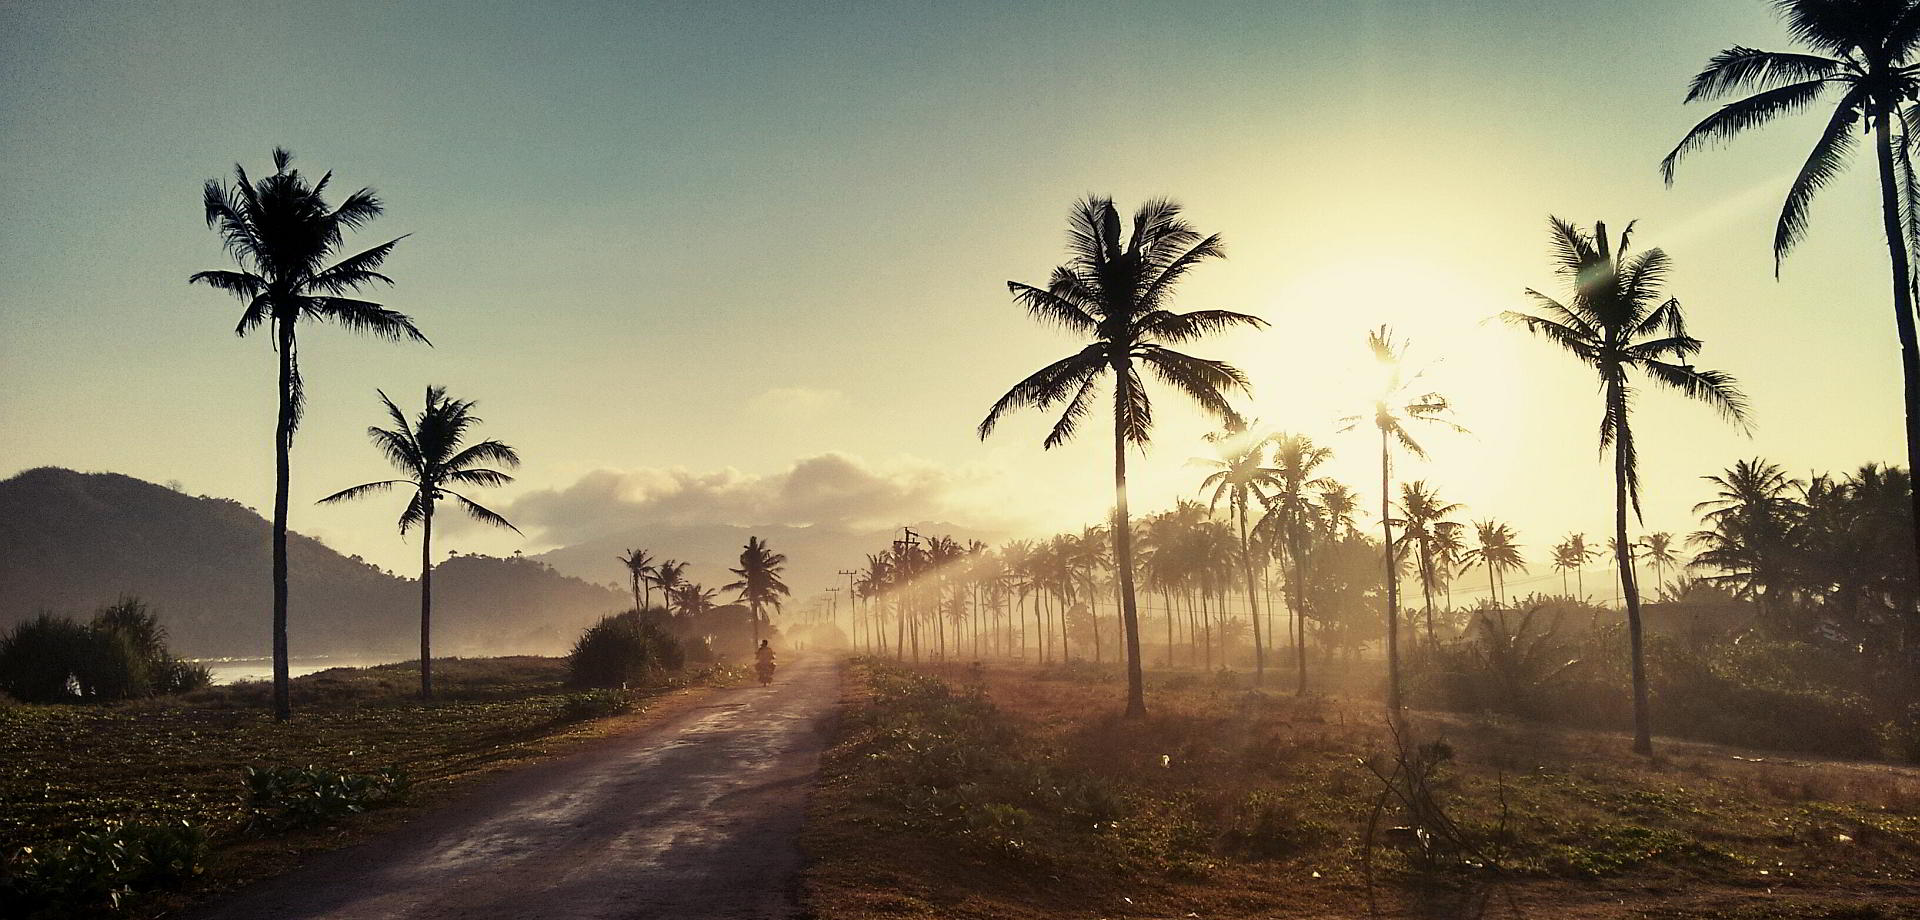 Kokos Plantage auf Java